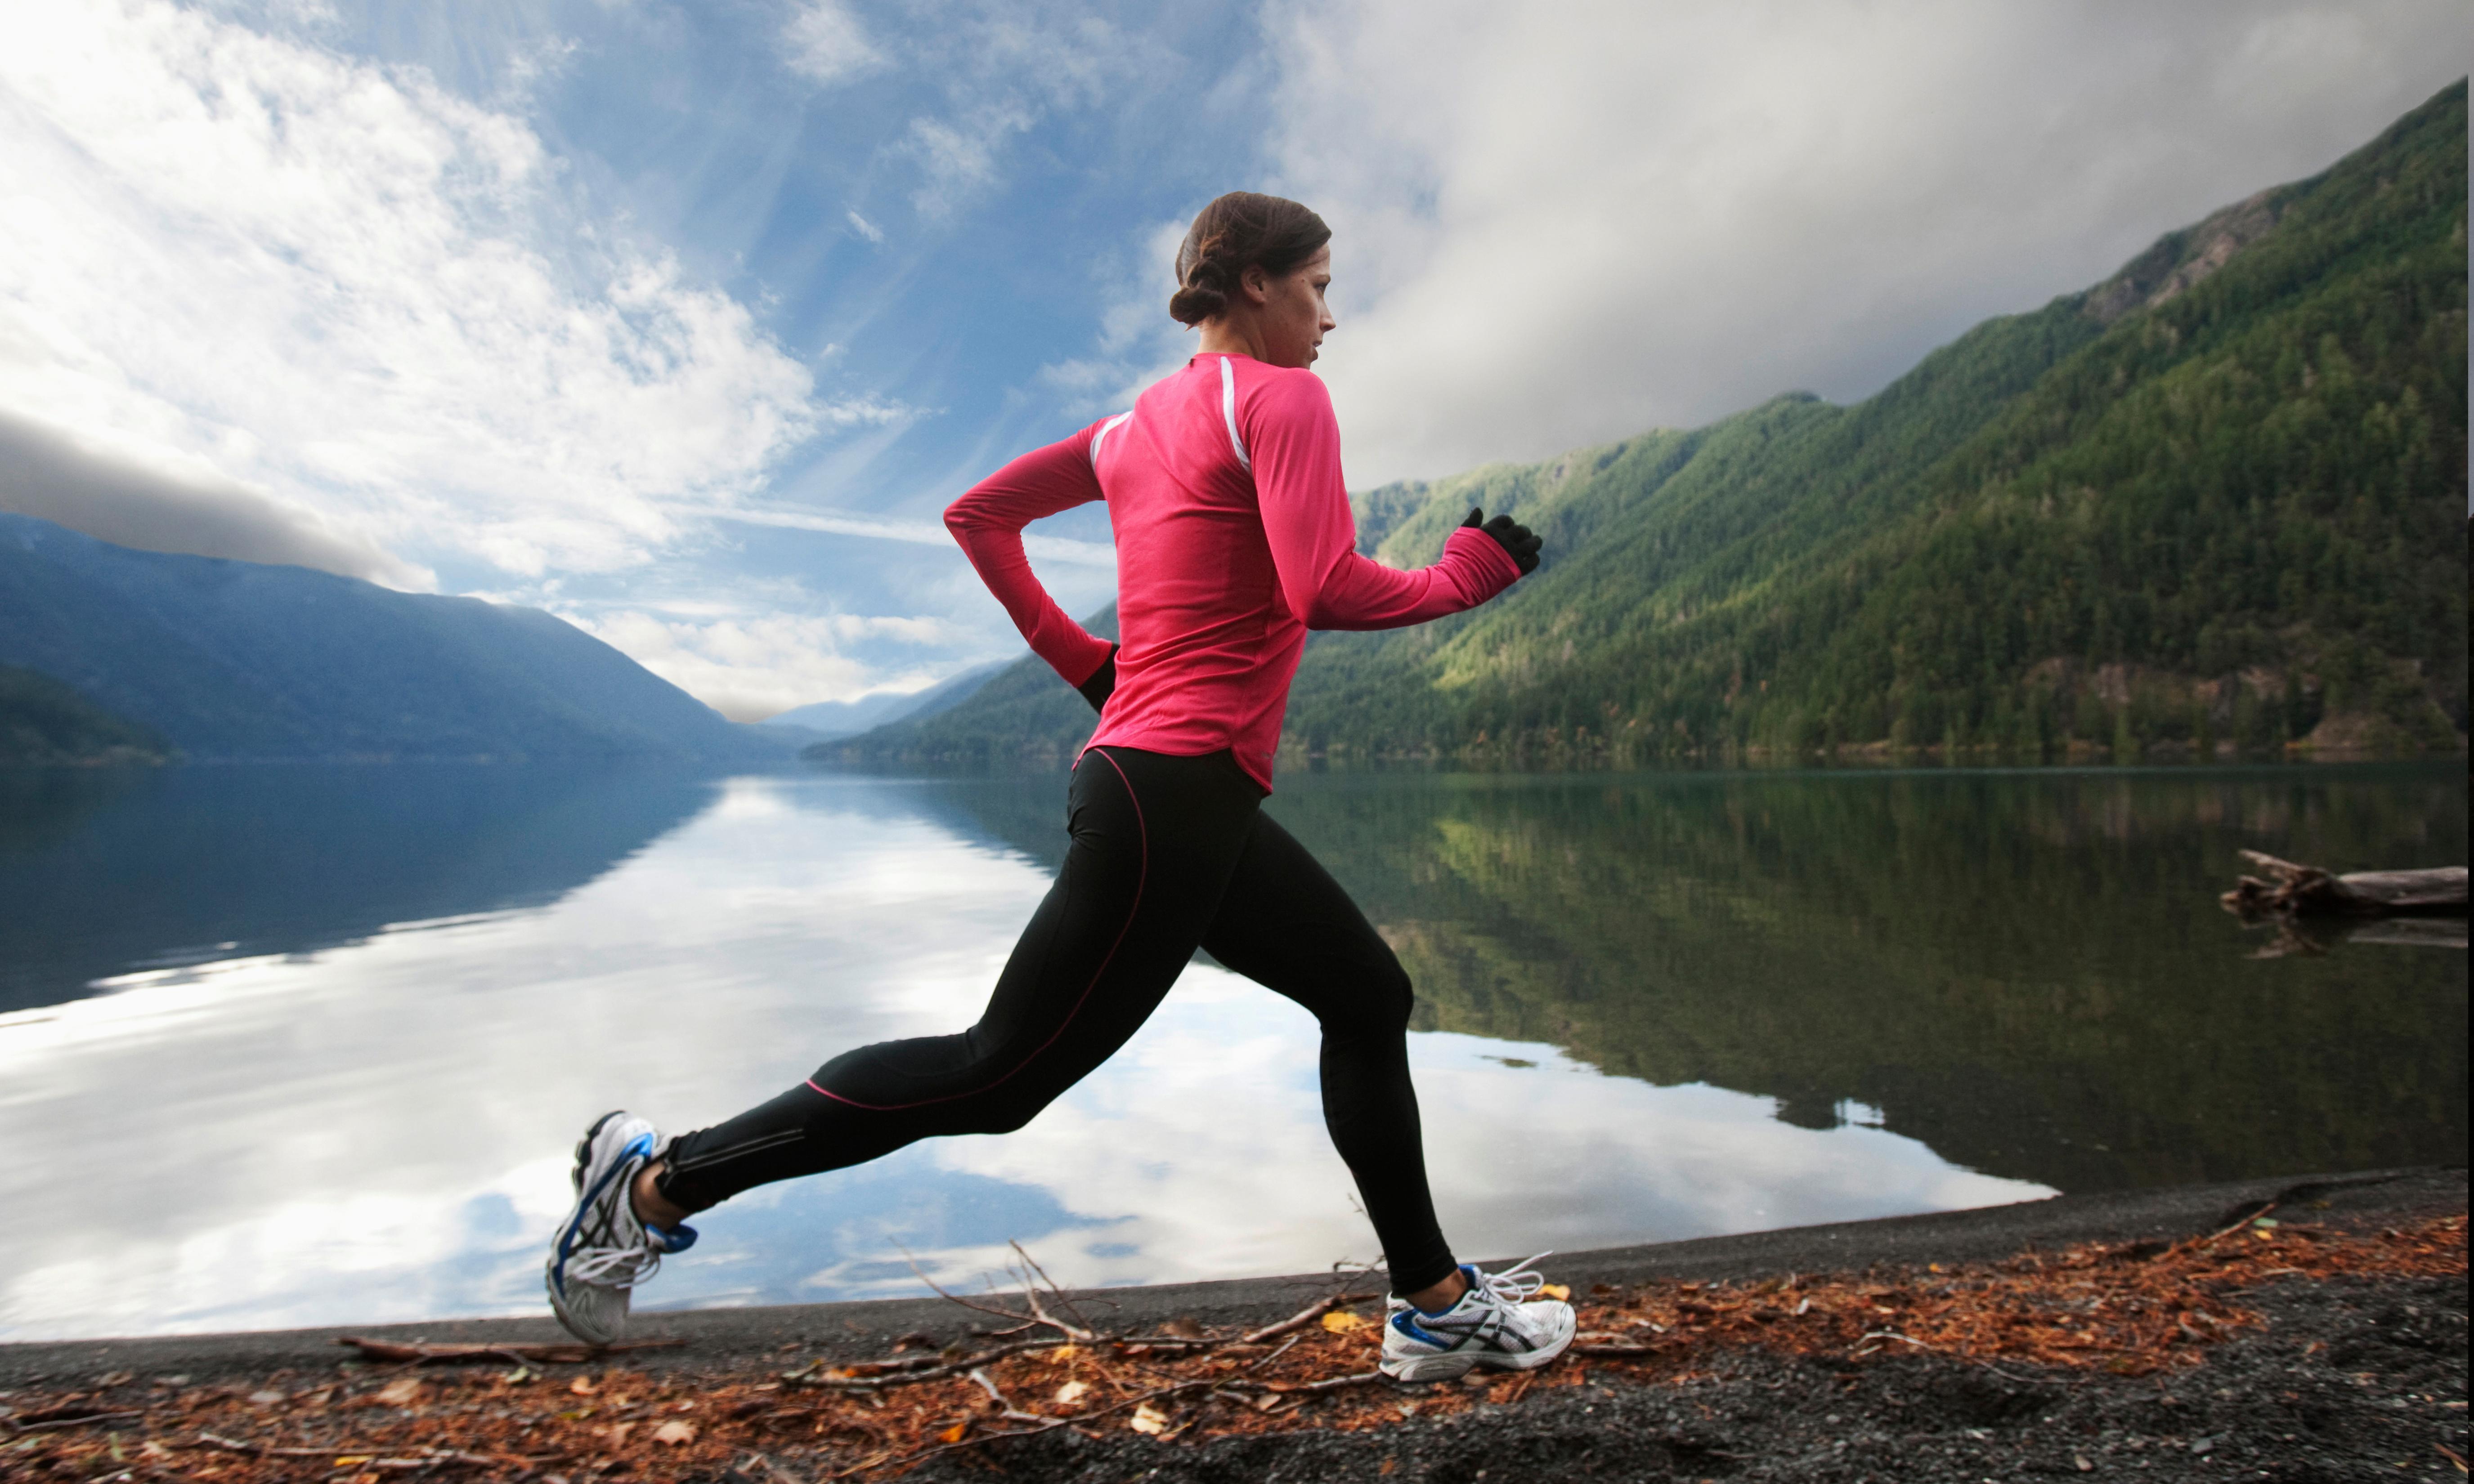 Five reasons to start trail running